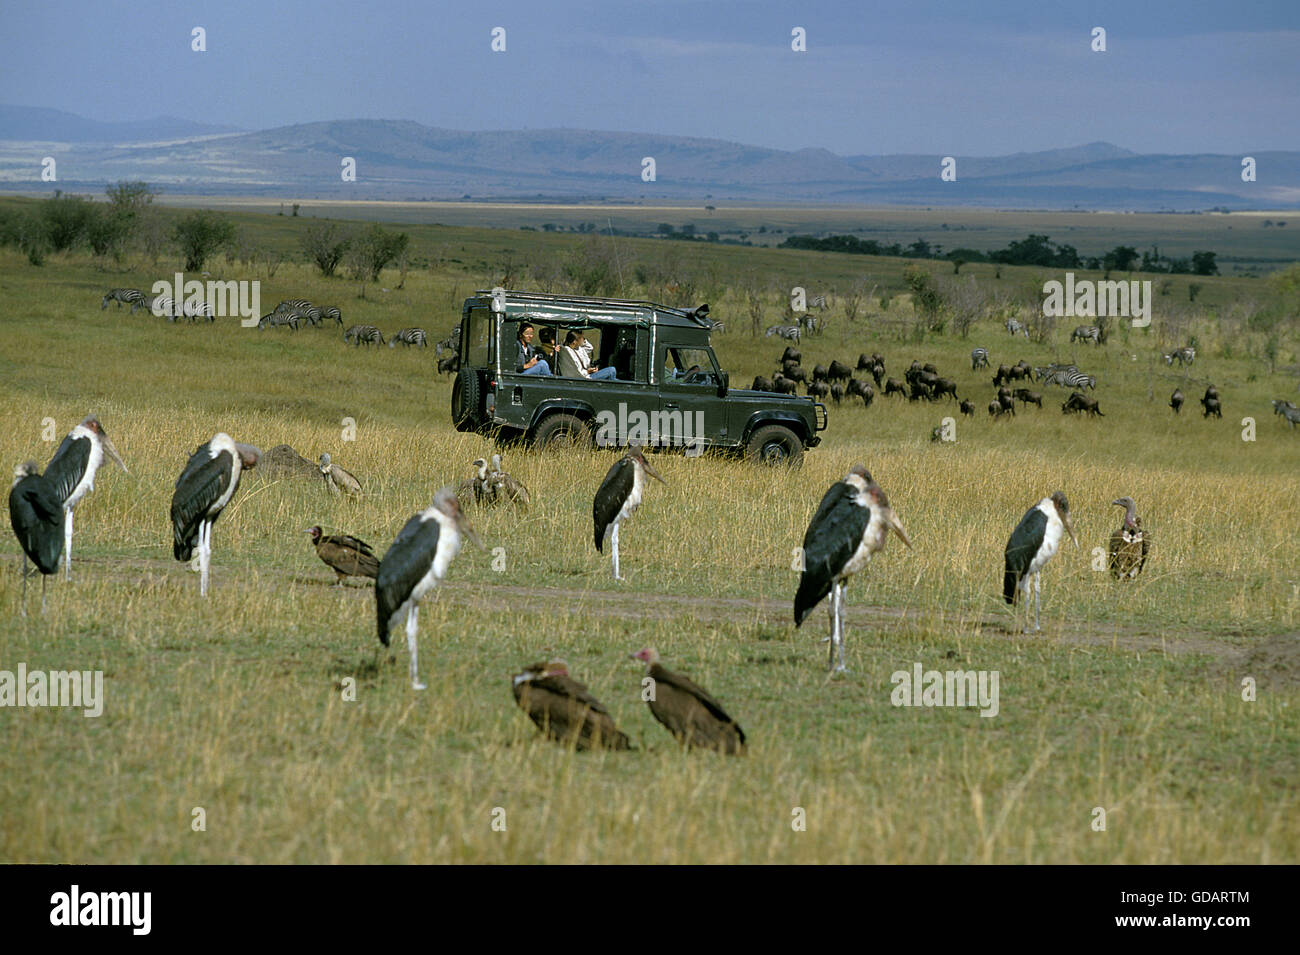 Tourist in 4 wheel drive vehicule watching Marabou Storks, Masai Mara Park in Kenya - Stock Image